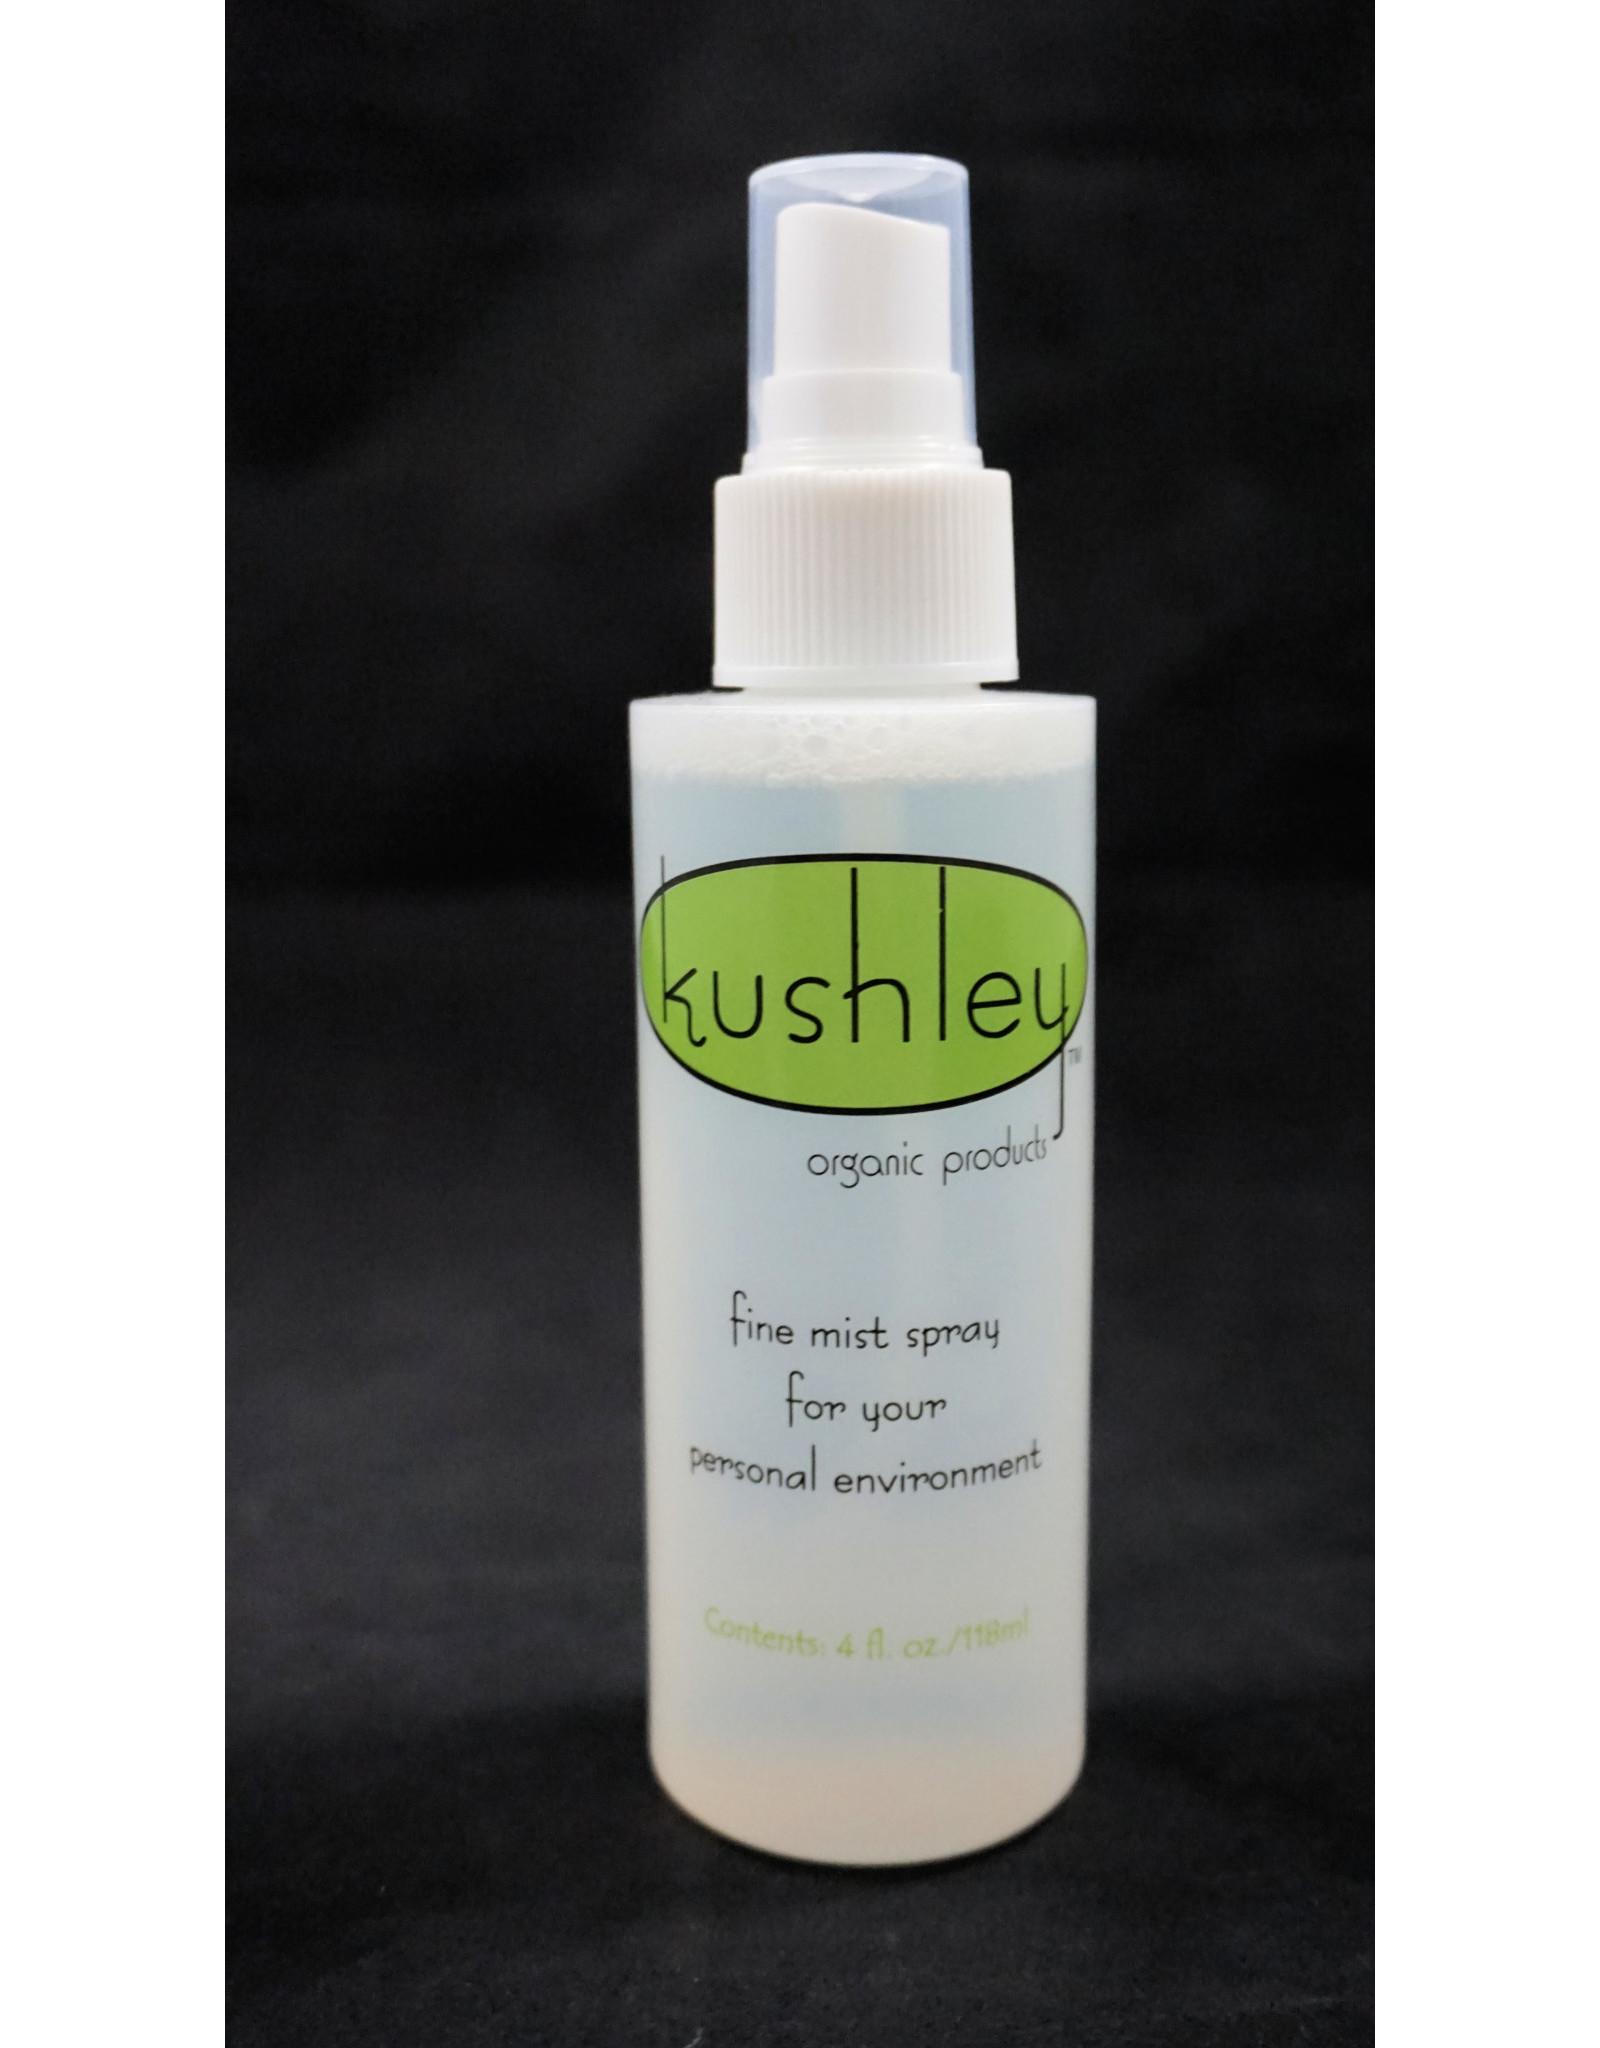 Kushley Kushley Spray 4oz